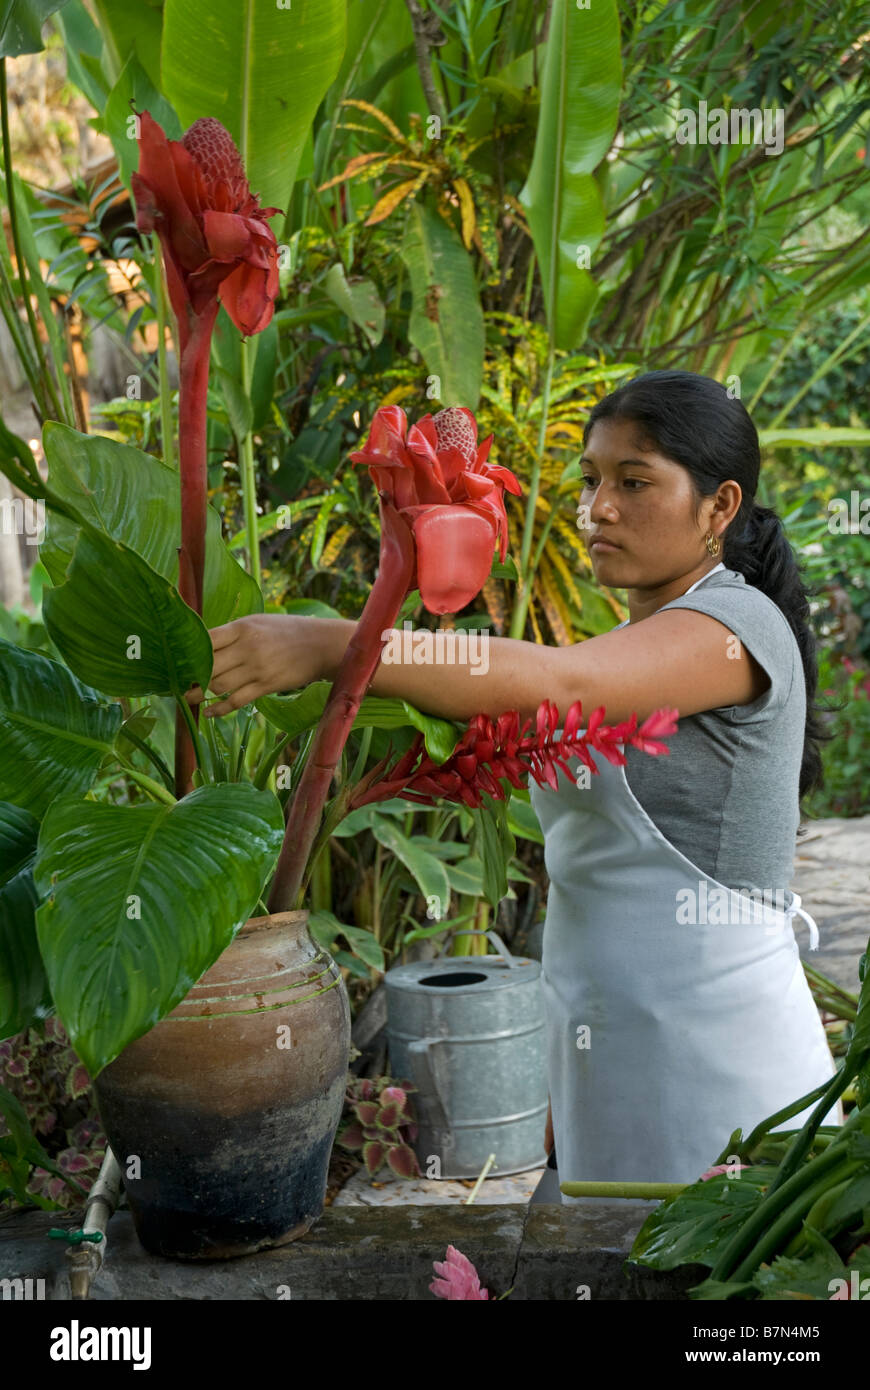 Honduras, Copan, Hacienda San Lucas. Arranging flowers at the Hacienda San Lucas - Stock Image